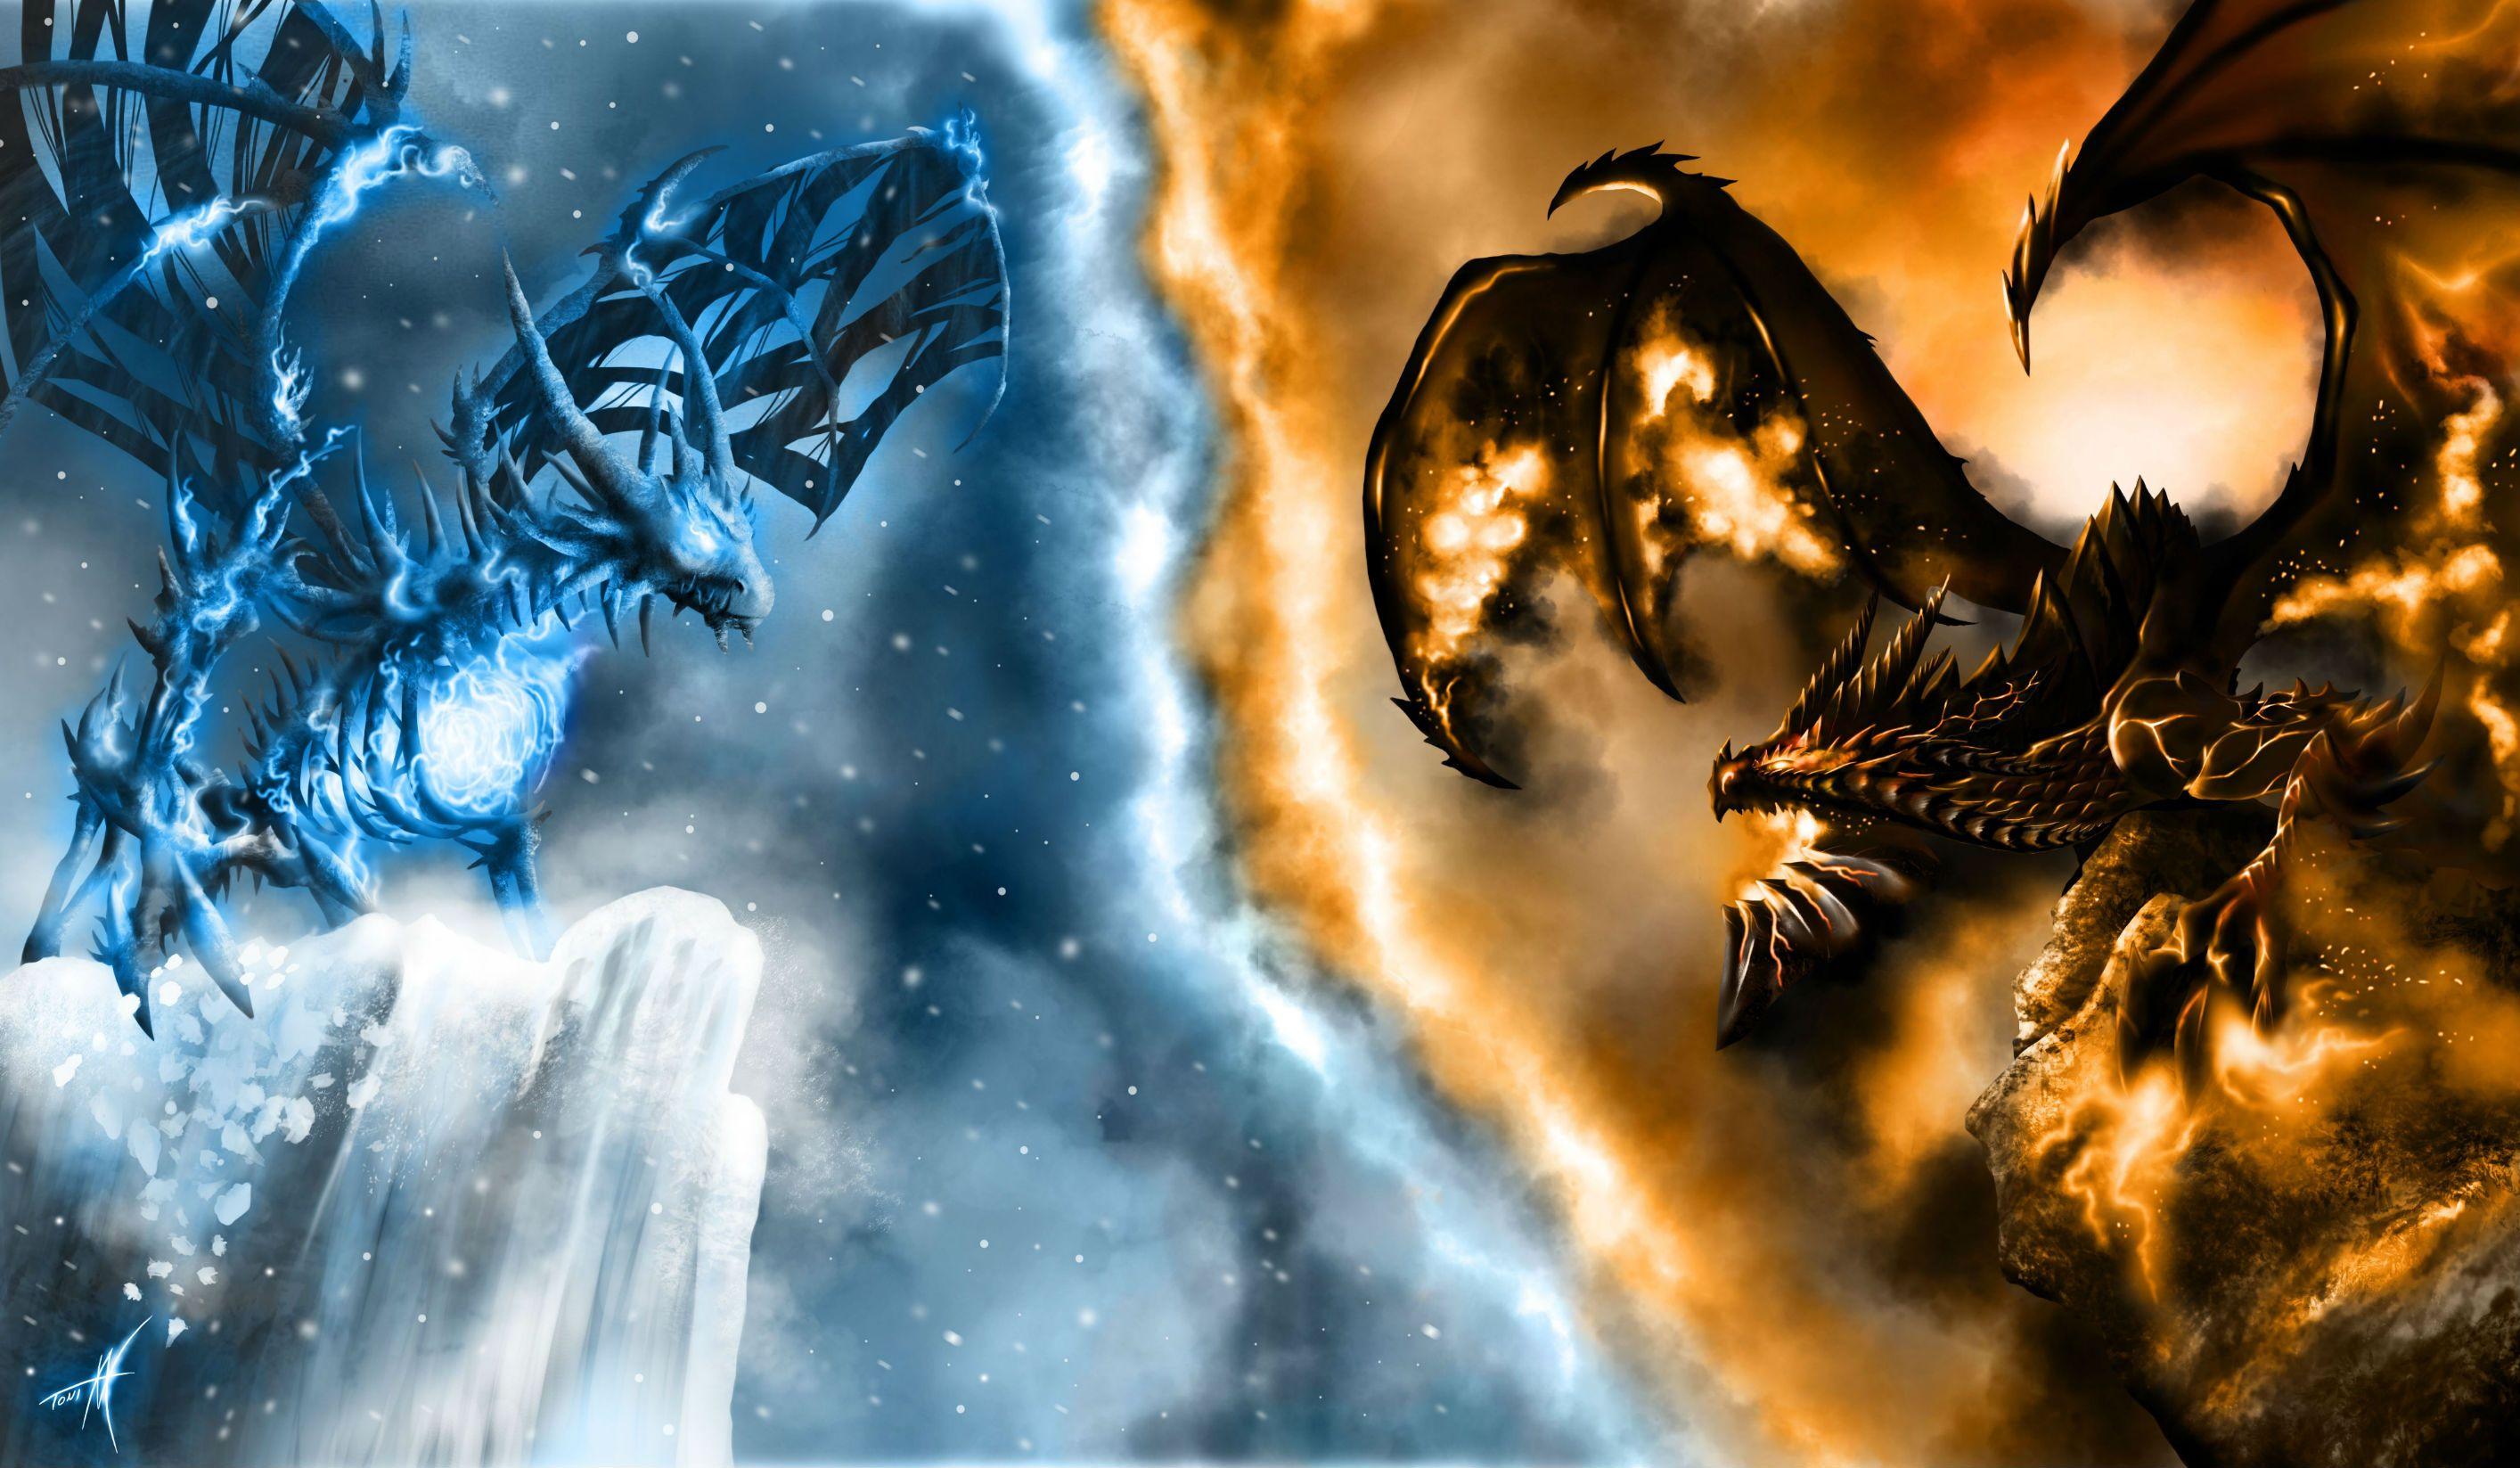 Lightning Dragon Wallpaper Of Warcraft Wow Dragons Fire Snow